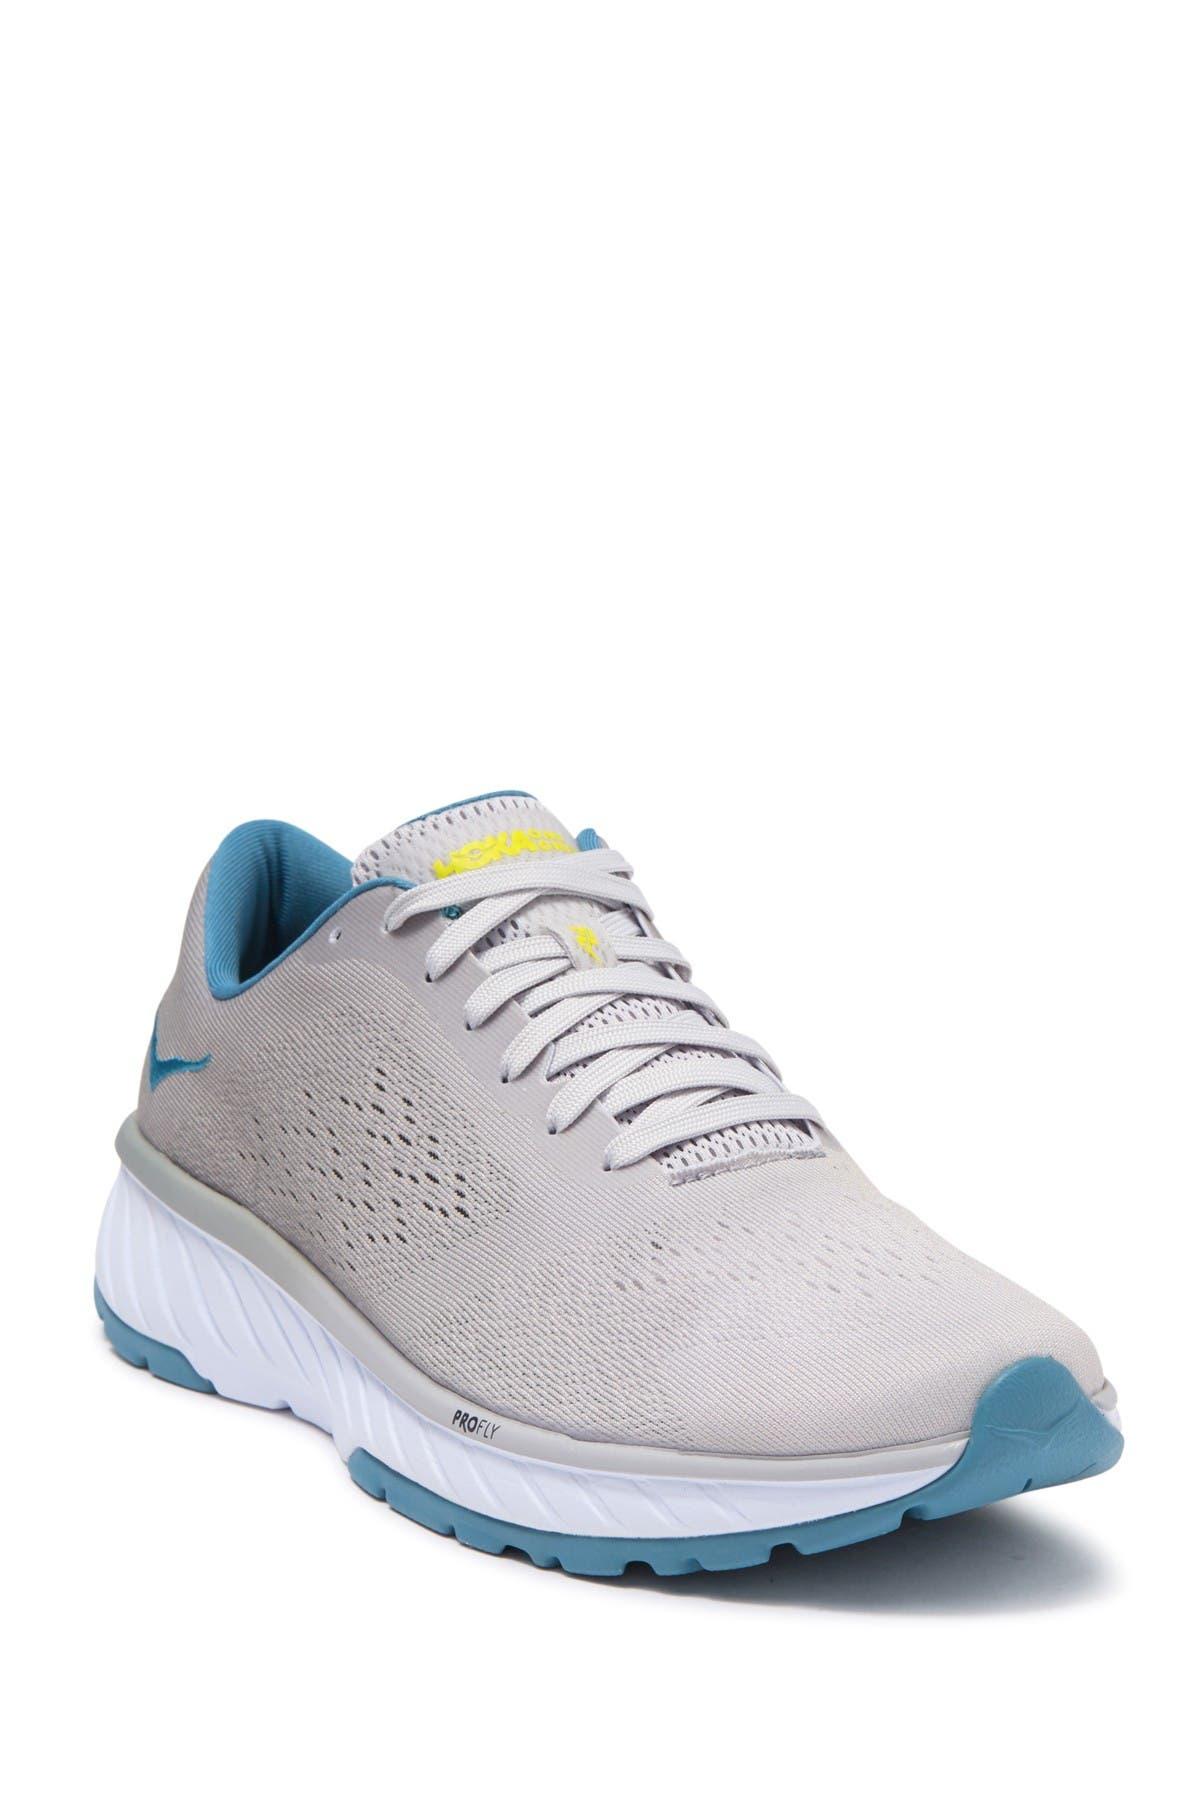 ONE | Cavu Running Shoe | Nordstrom Rack